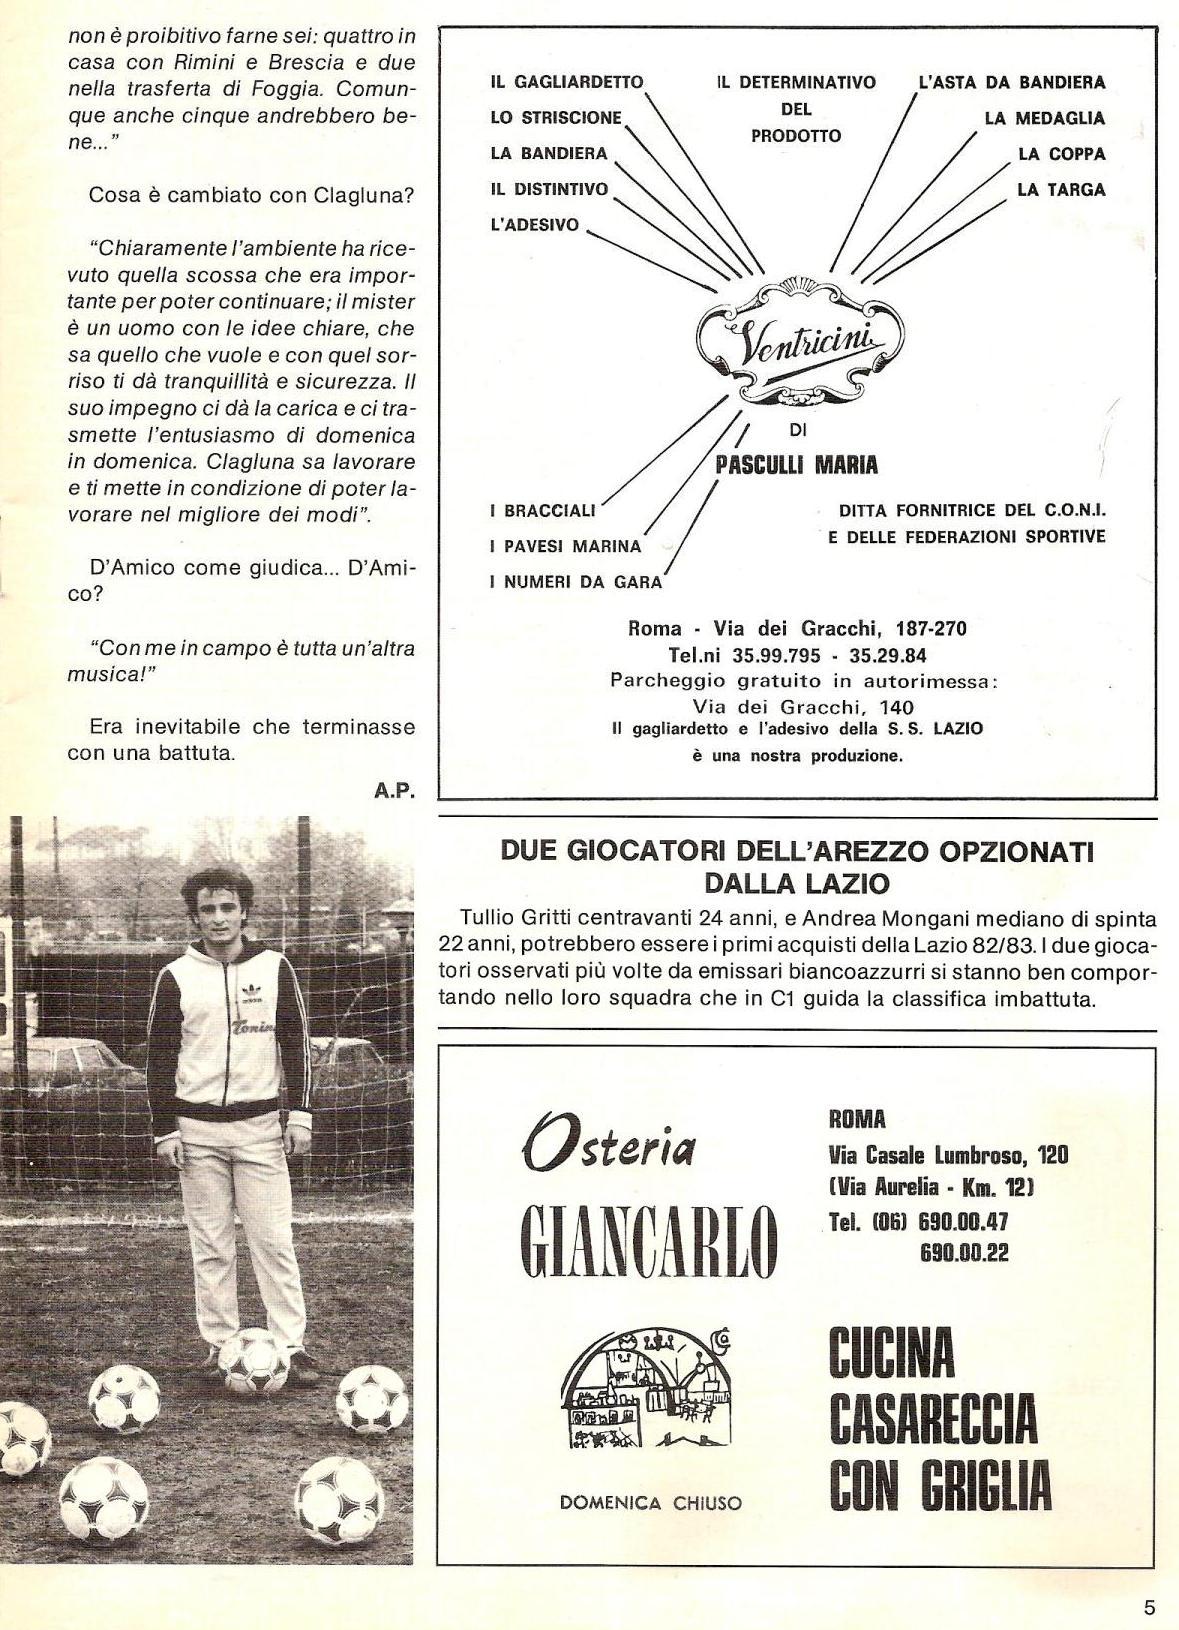 Eagles Supporters del 21 febbraio 1982